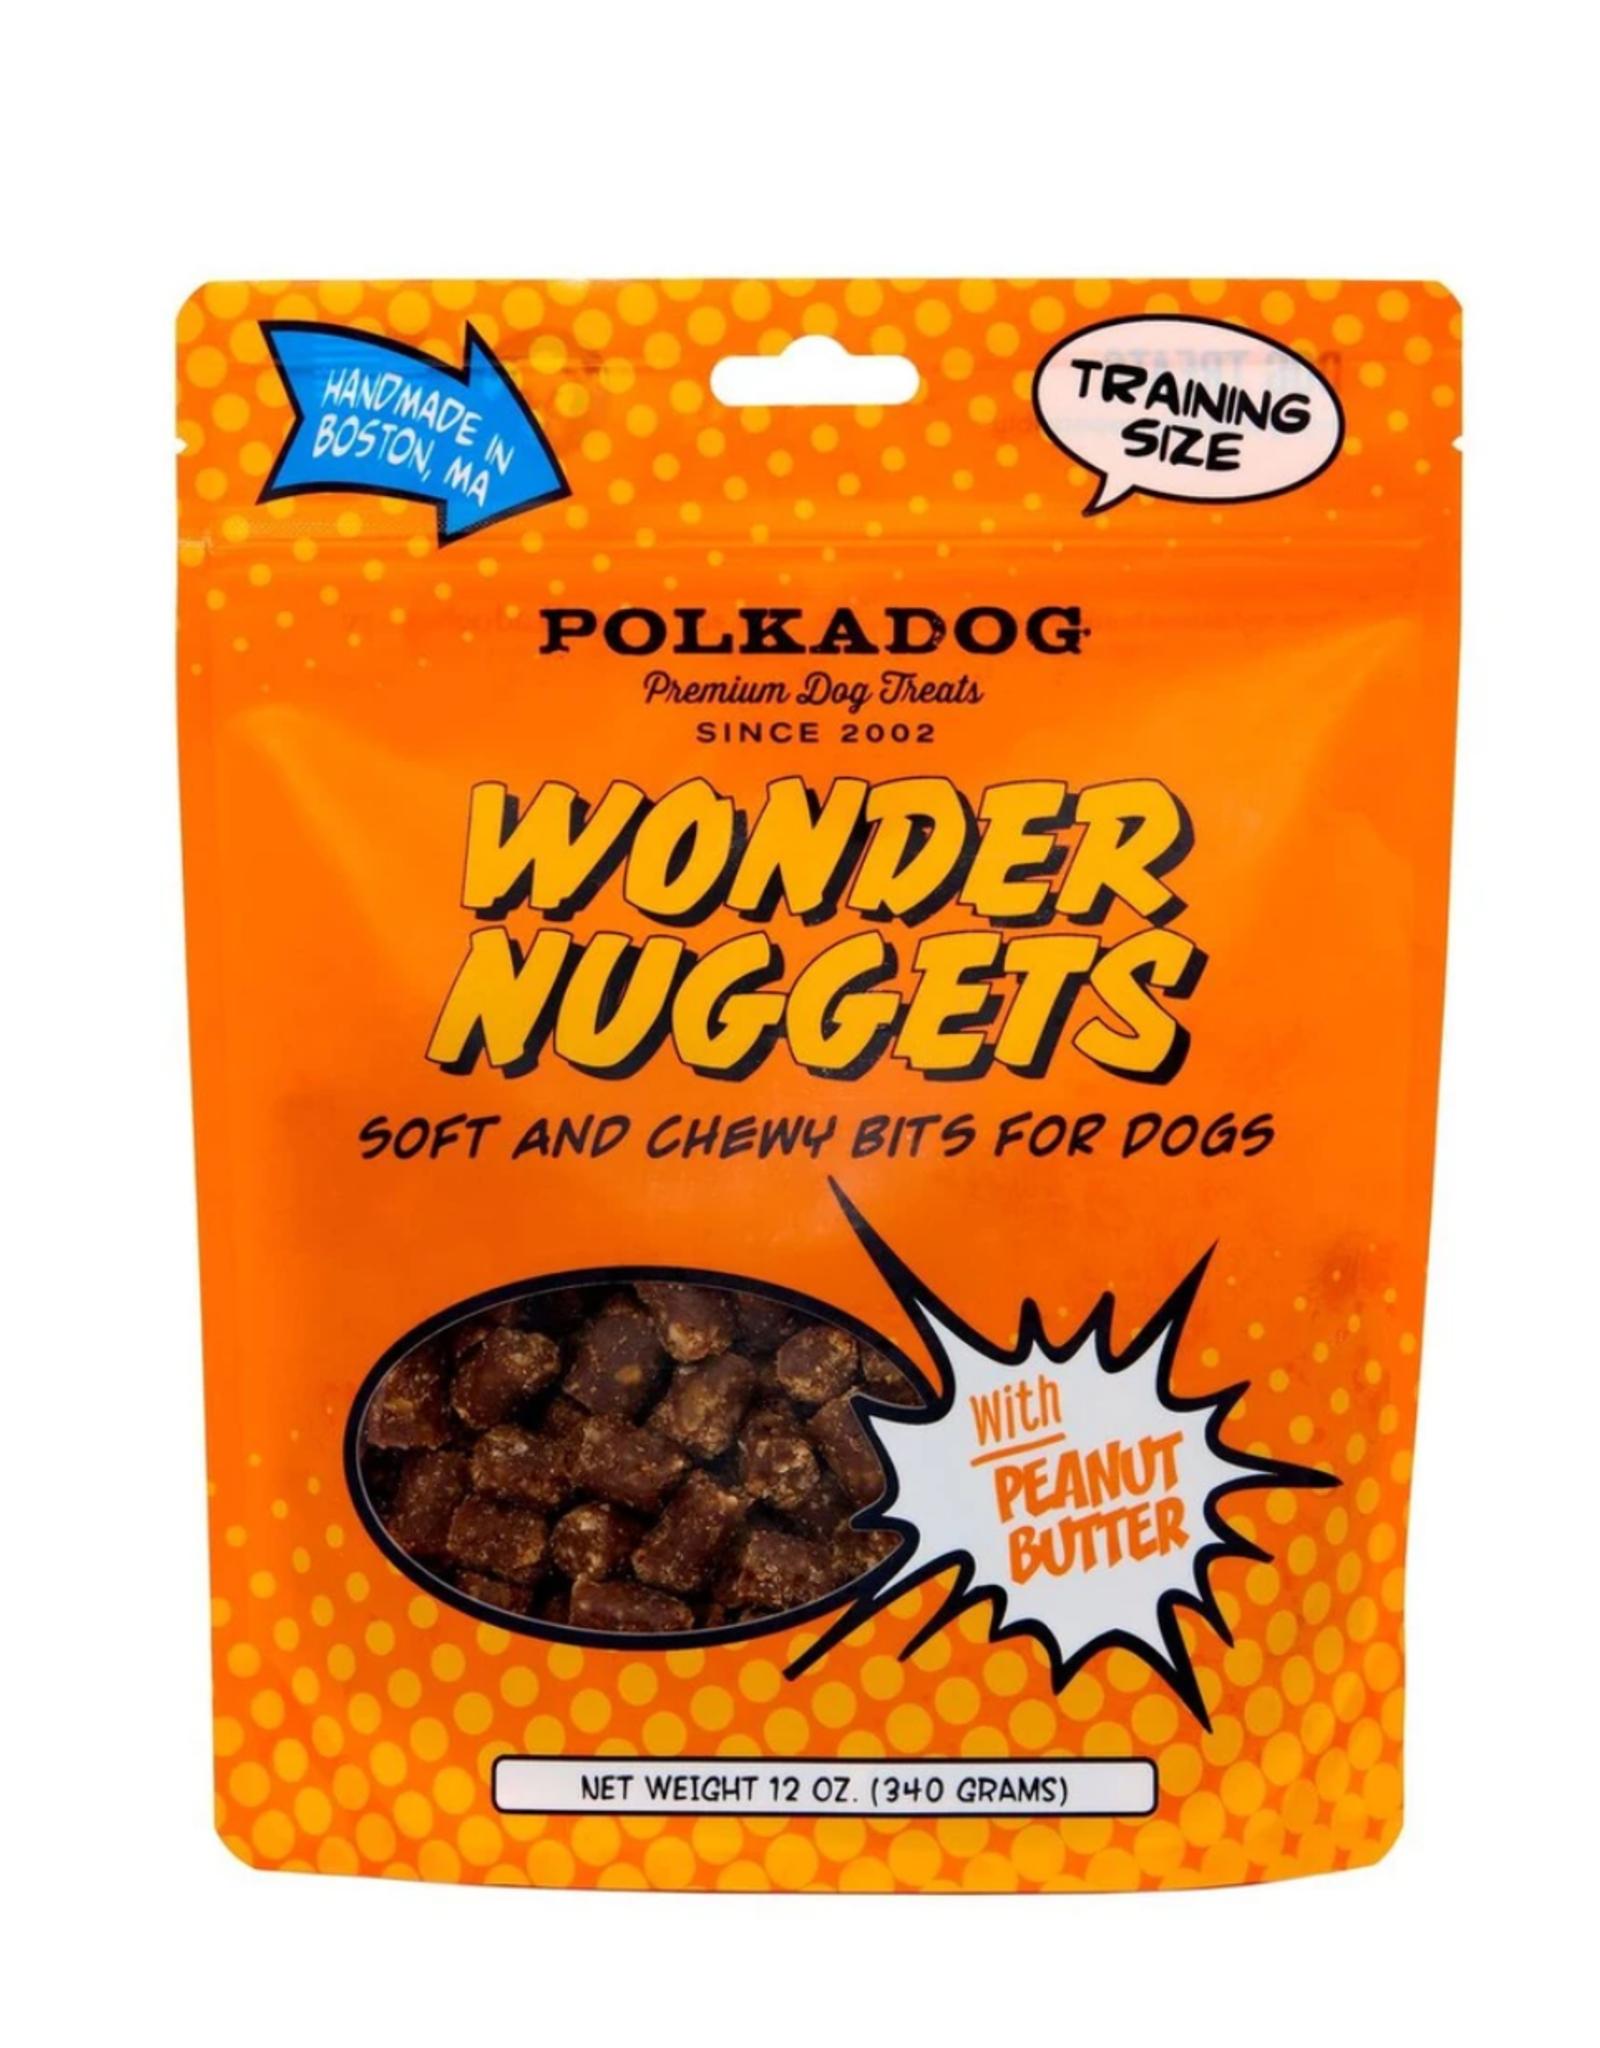 Polka Dog Wonder Nugget Peanut Butter 12oz